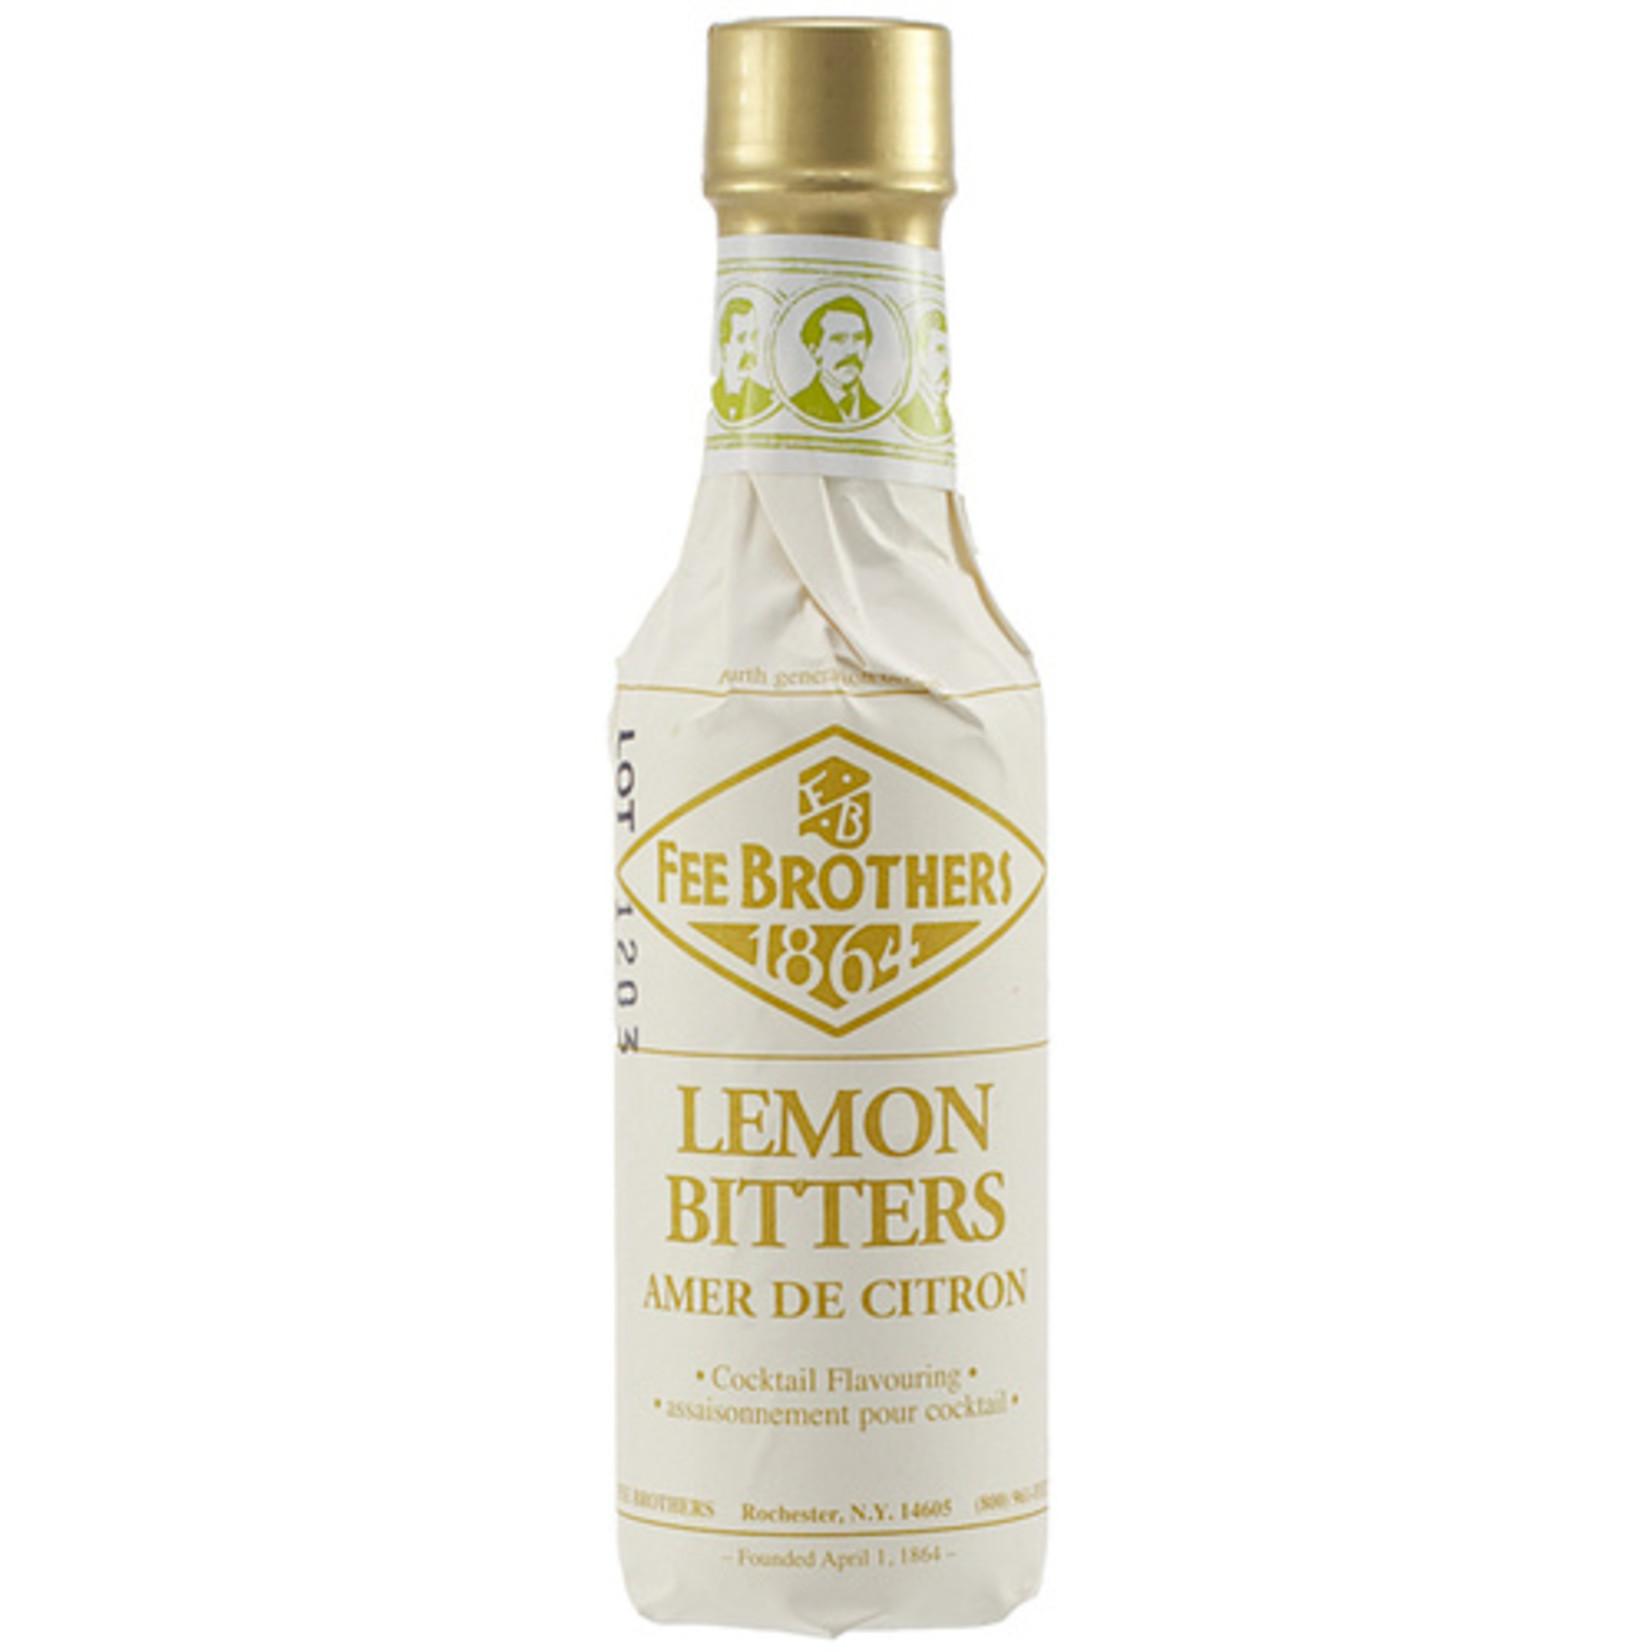 Fee Brothers Fee Brothers Bitters Lemon